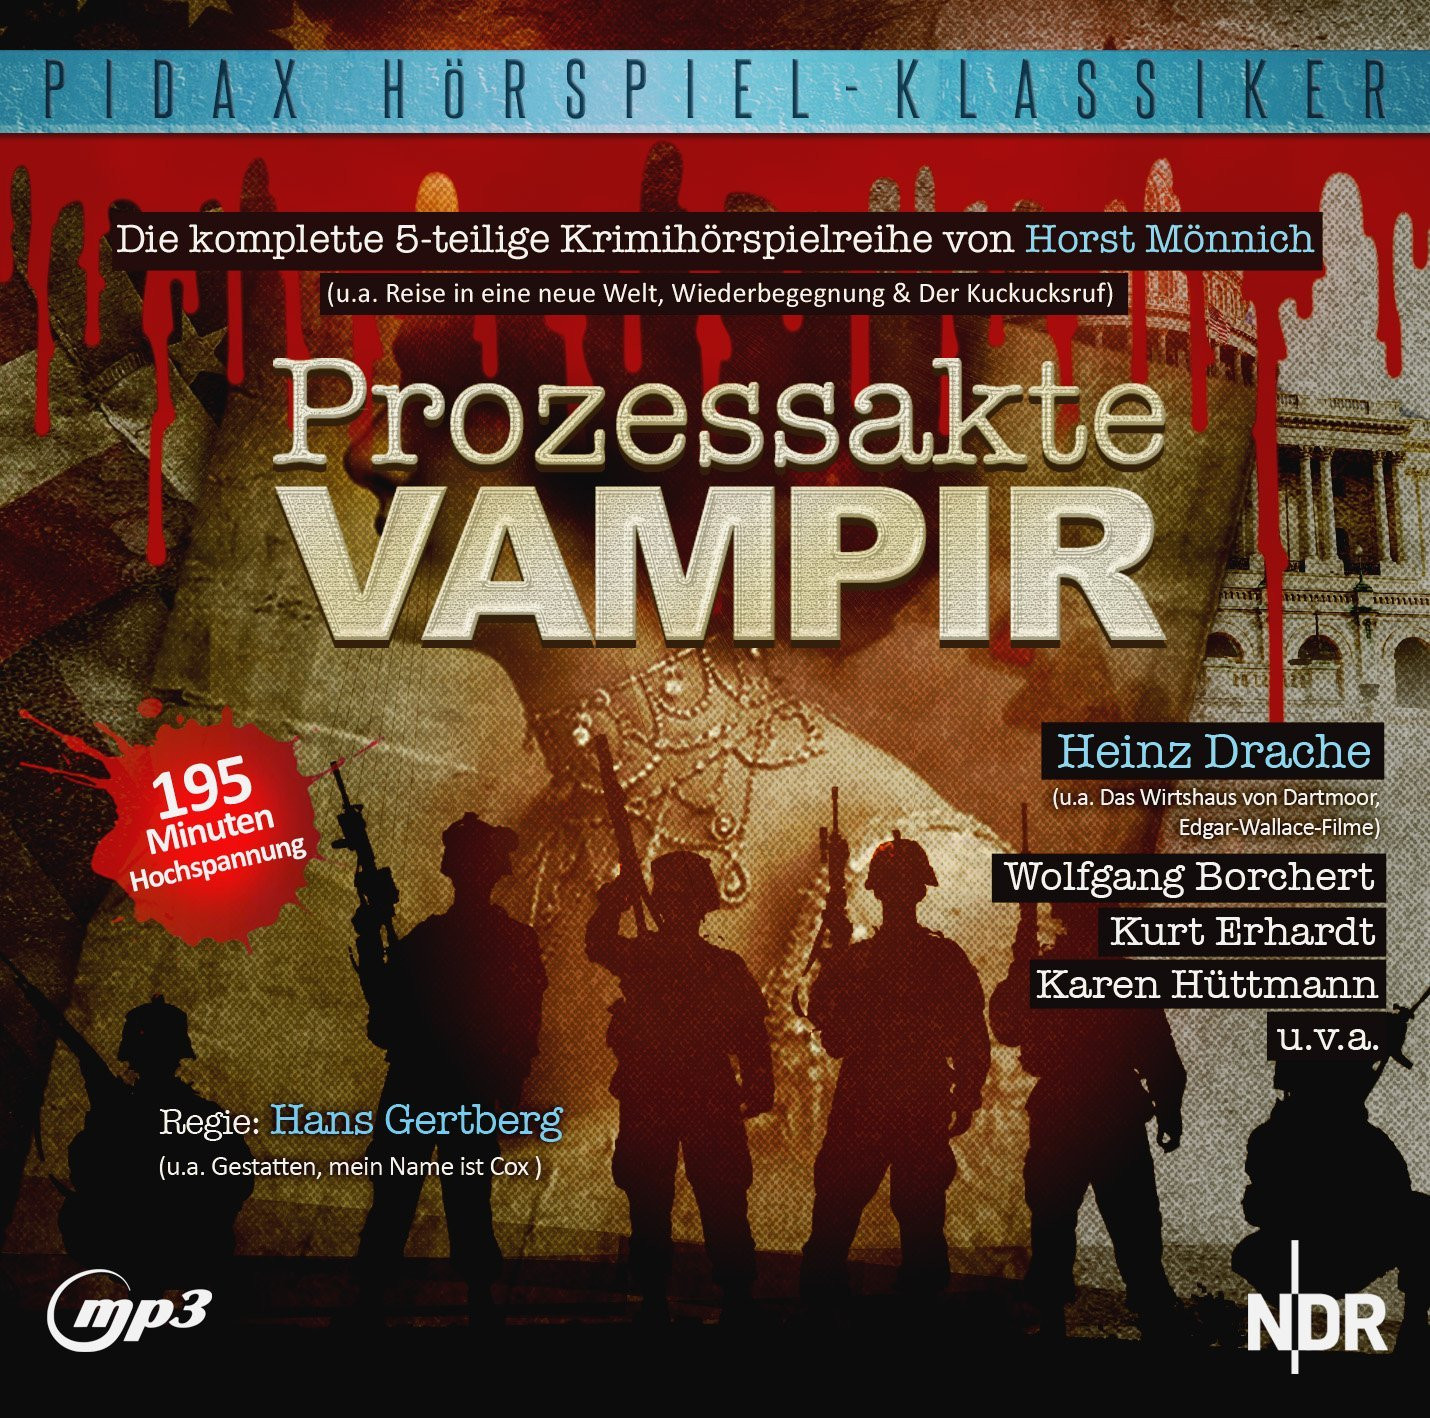 Pidax Hörspiel Klassiker - Prozessakte Vampir